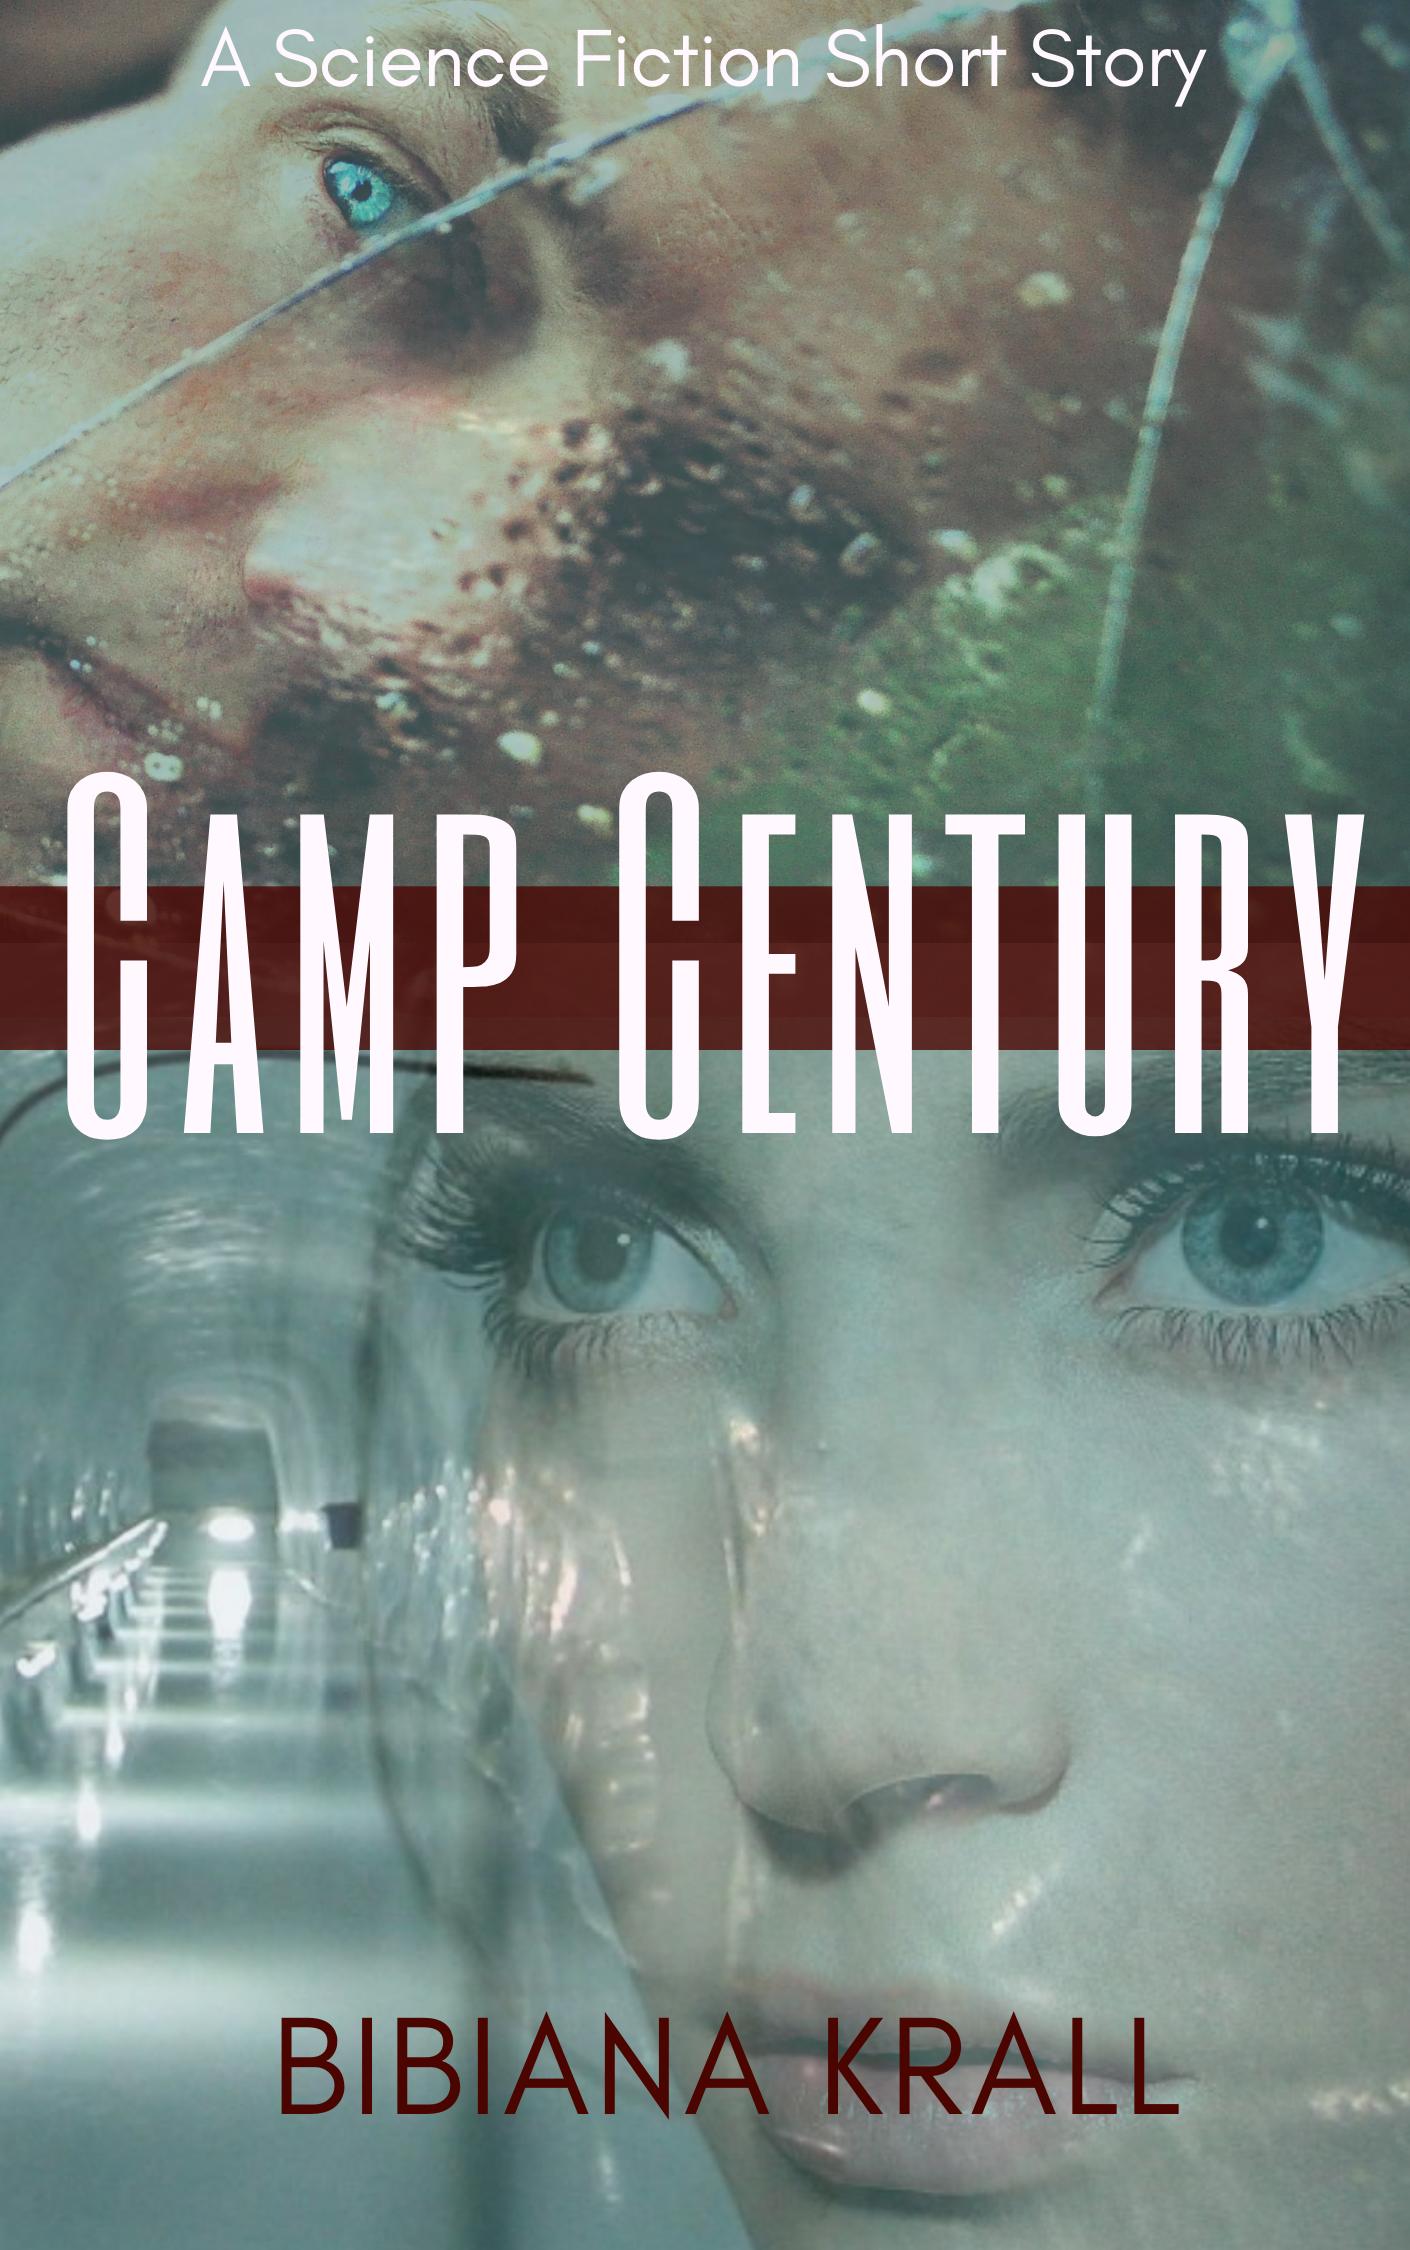 Camp Century by Bibiana Krall